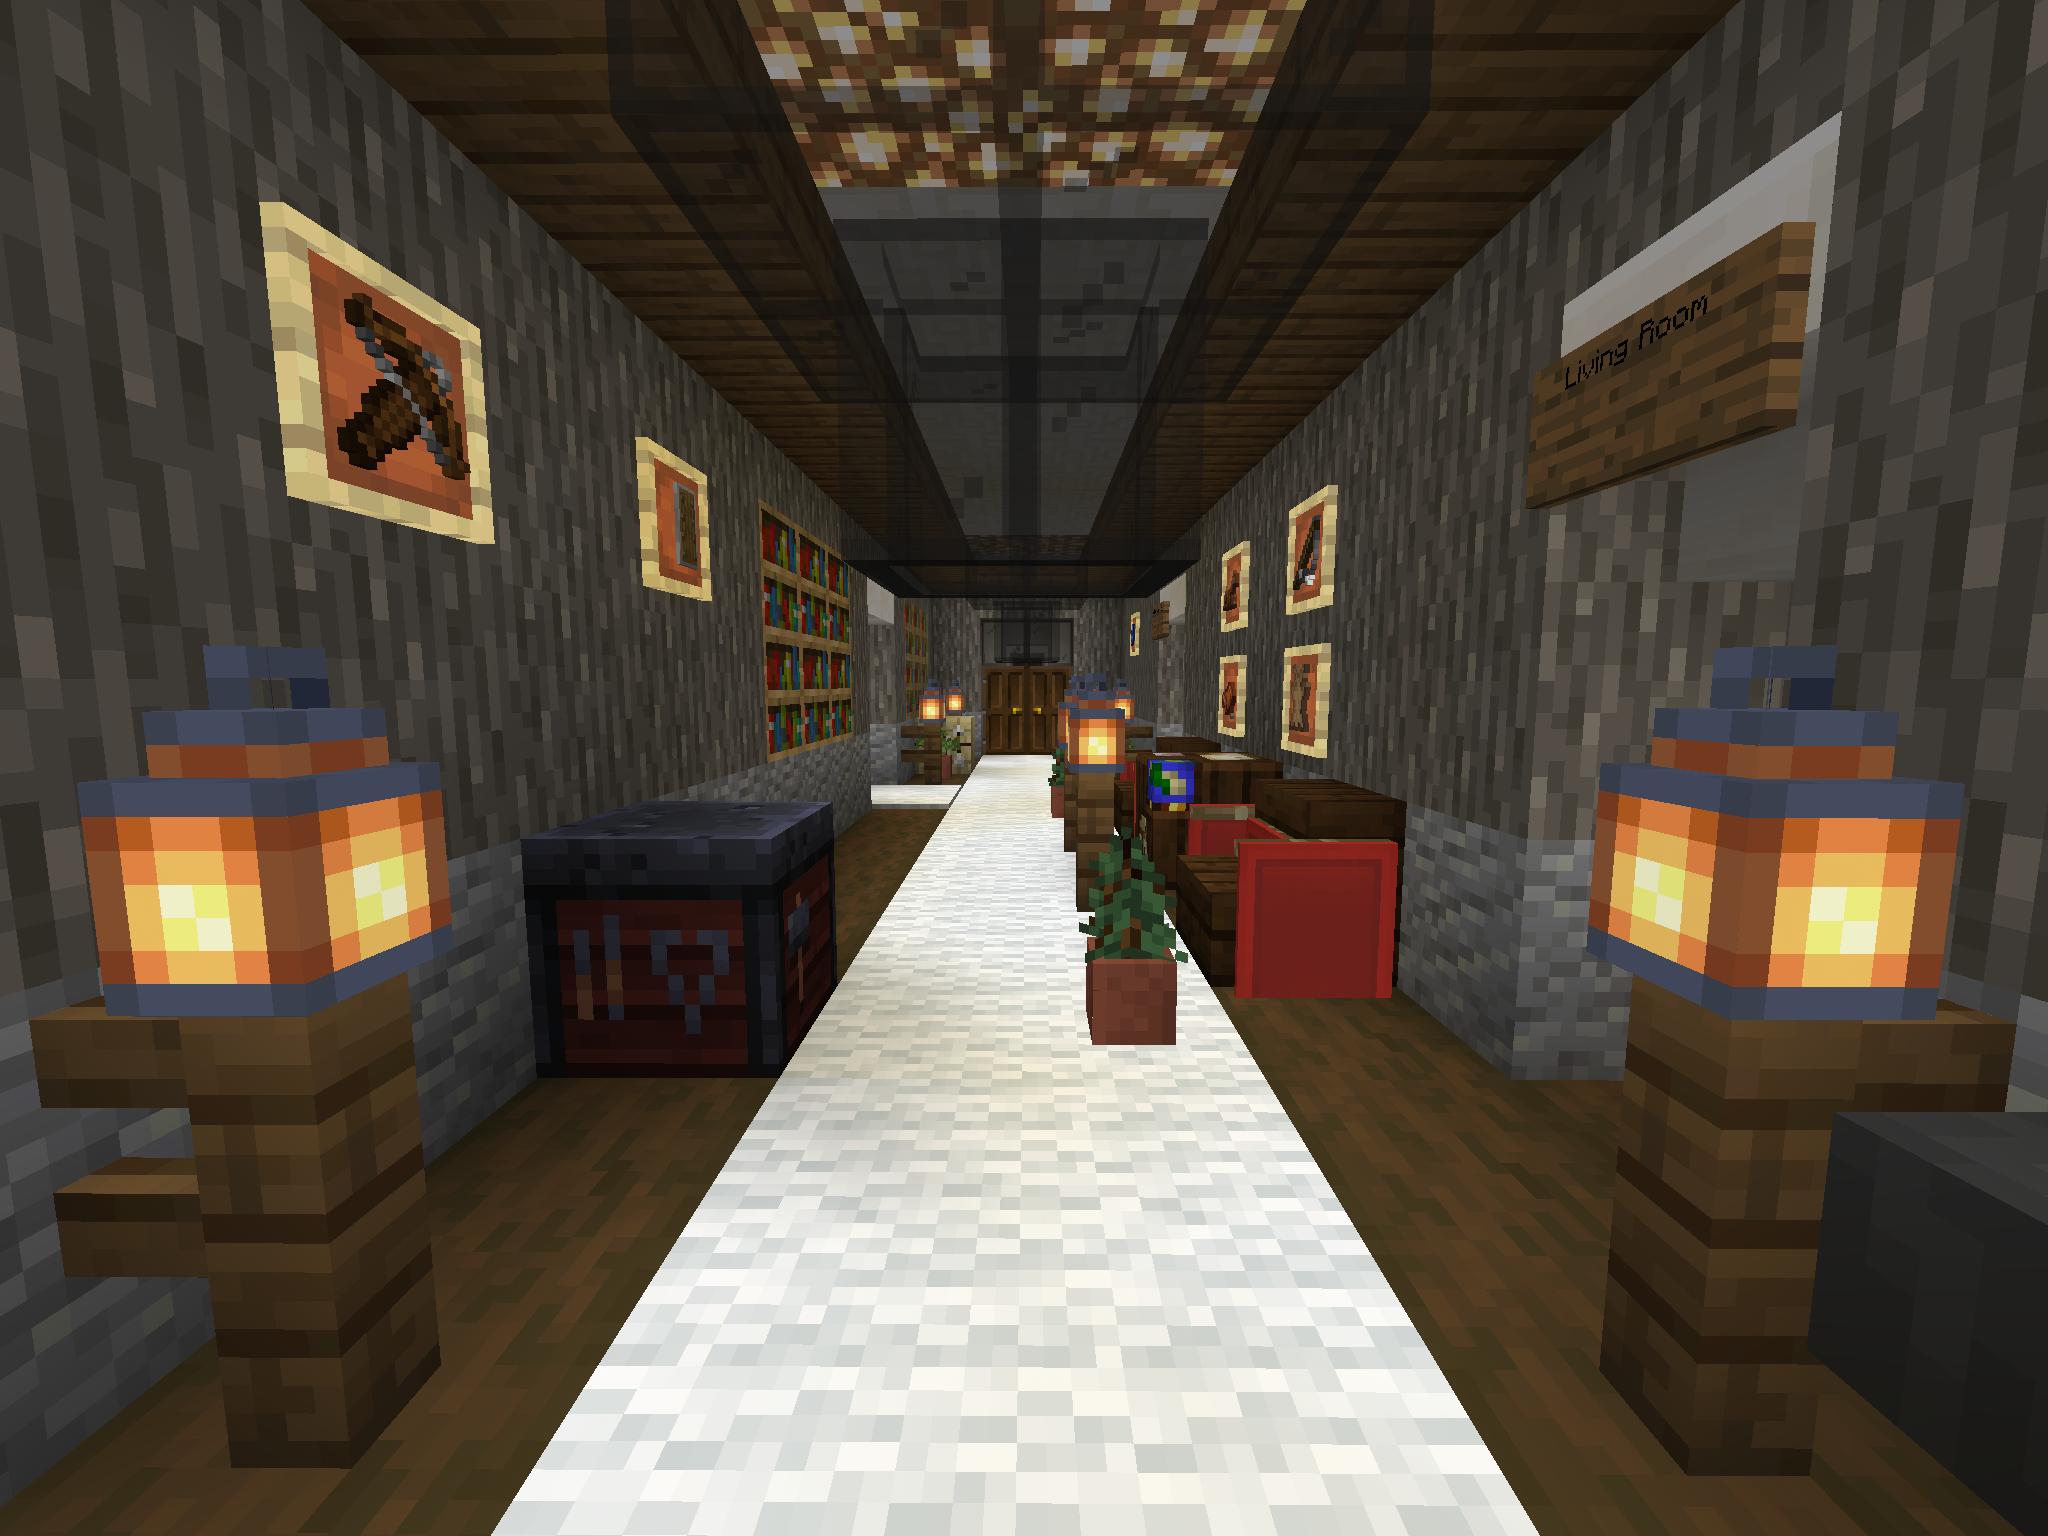 Pin on Minecraft House Interior Designs